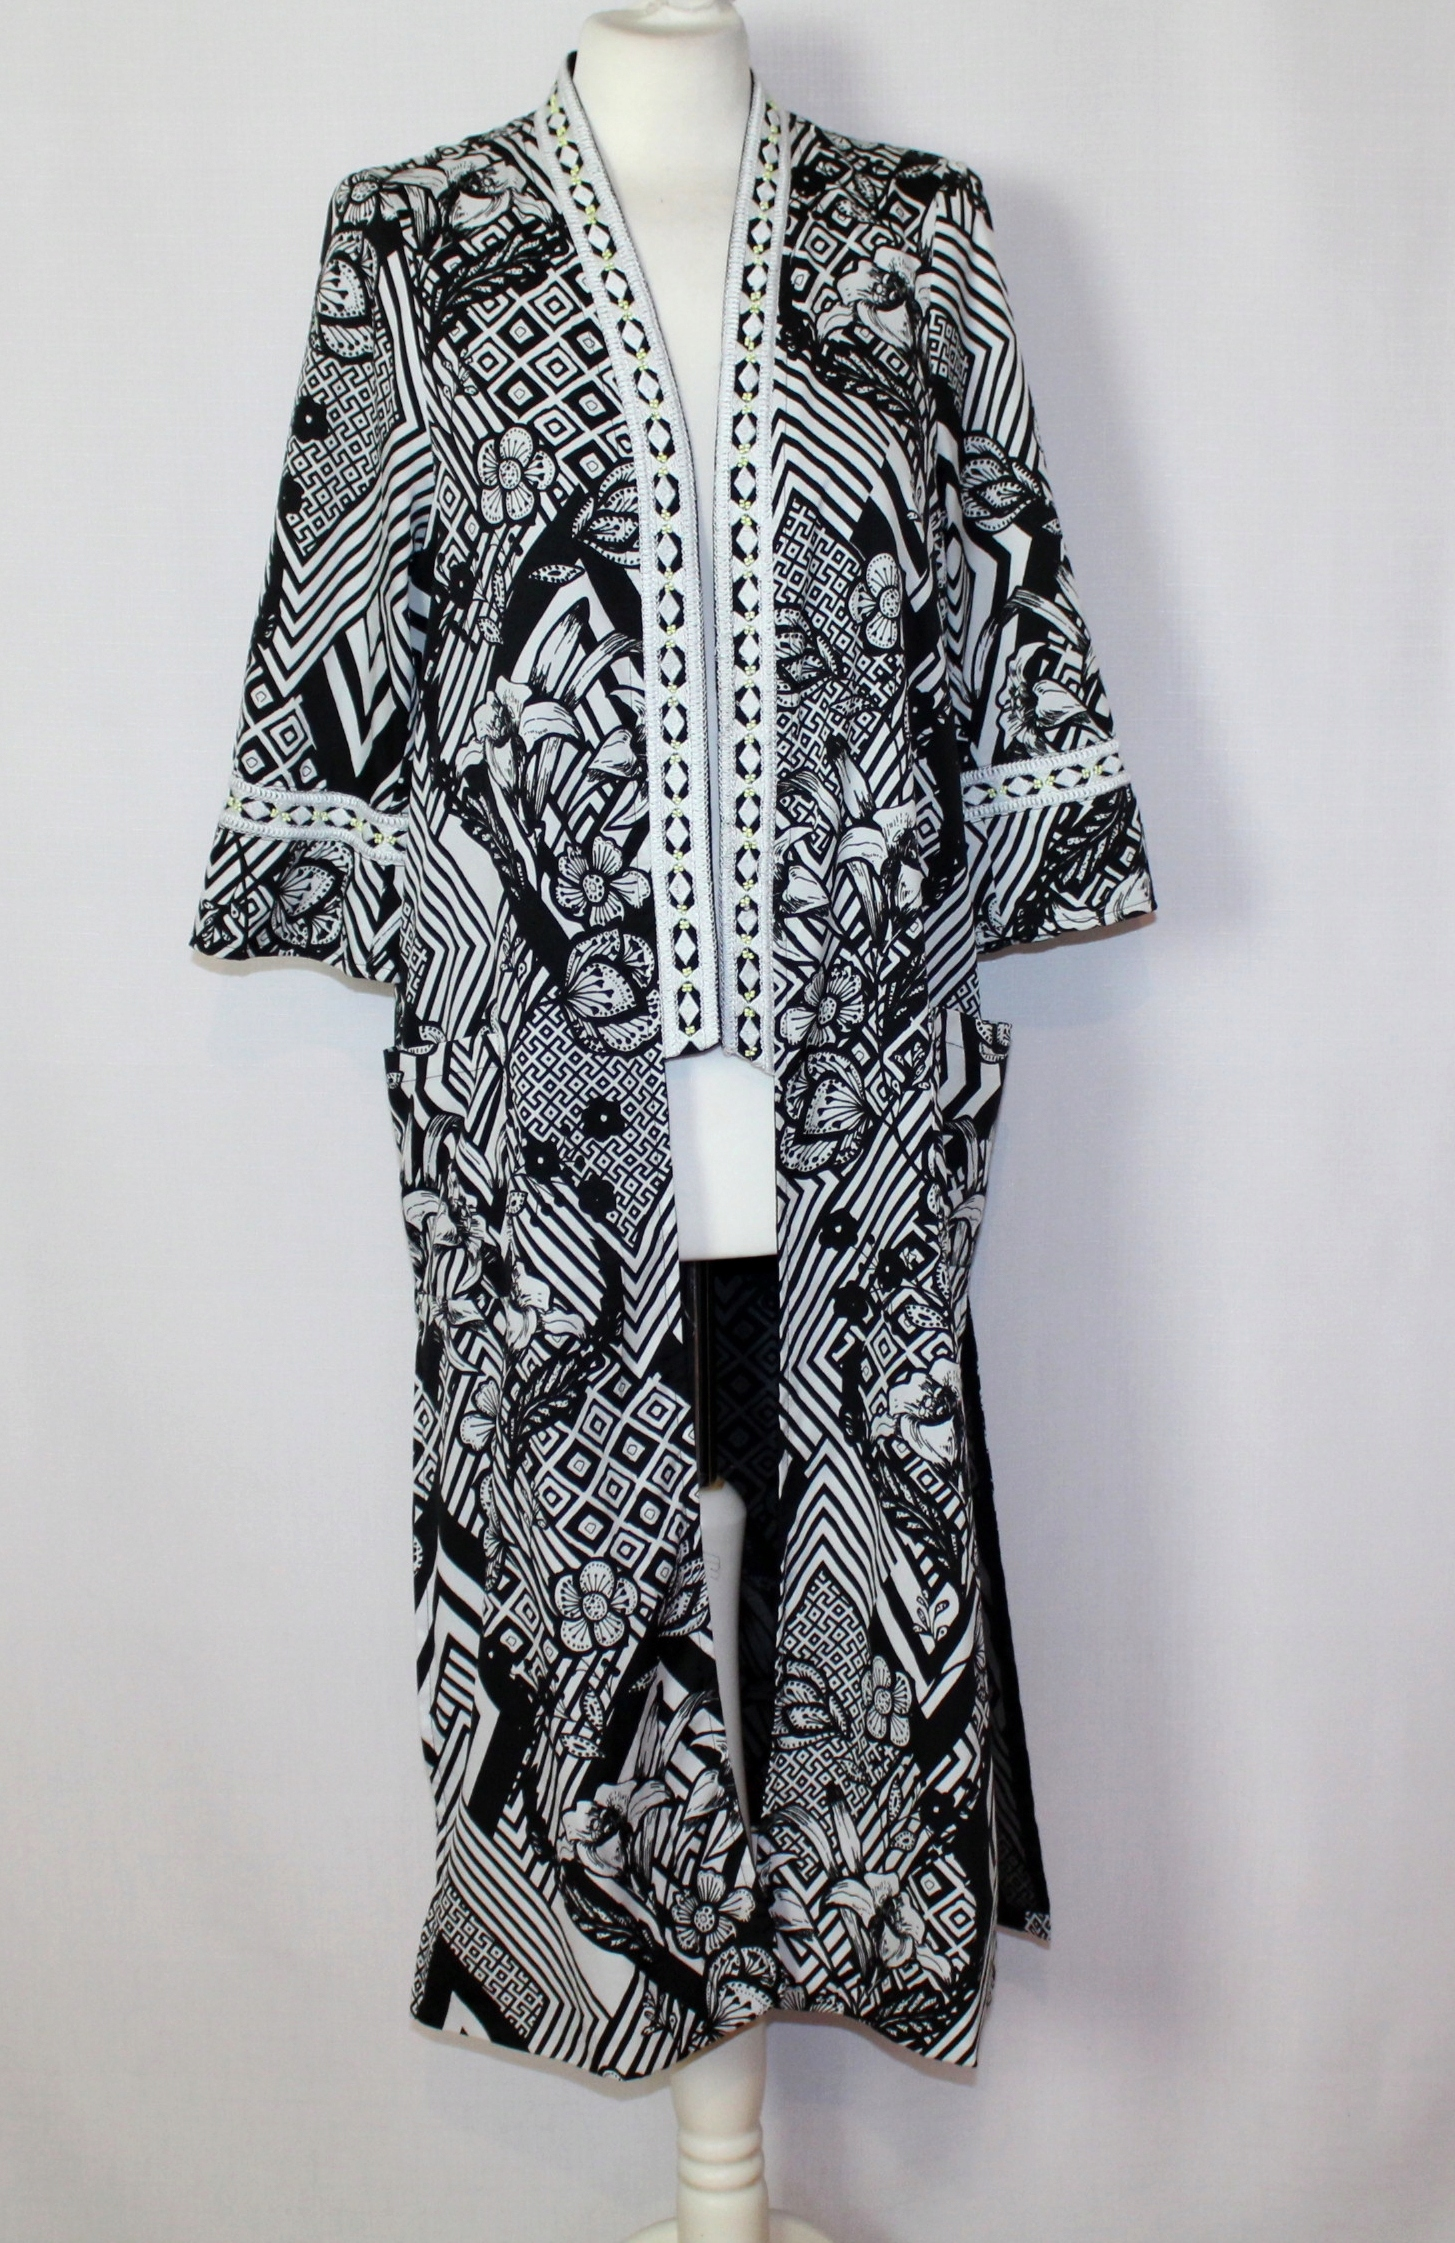 Lekka narzuta kimono we wzory RIVER ISLAND 42/14